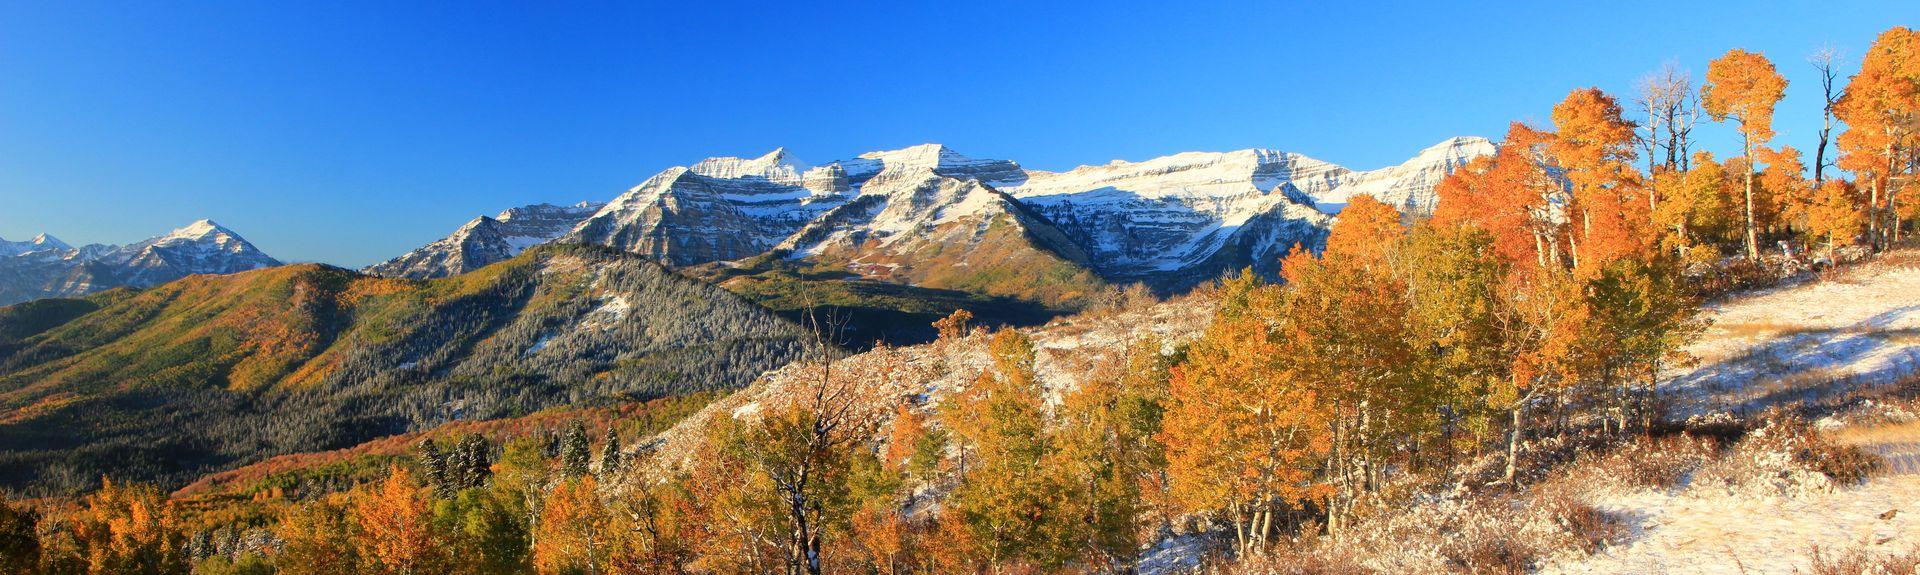 Sundance, Utah, Estados Unidos